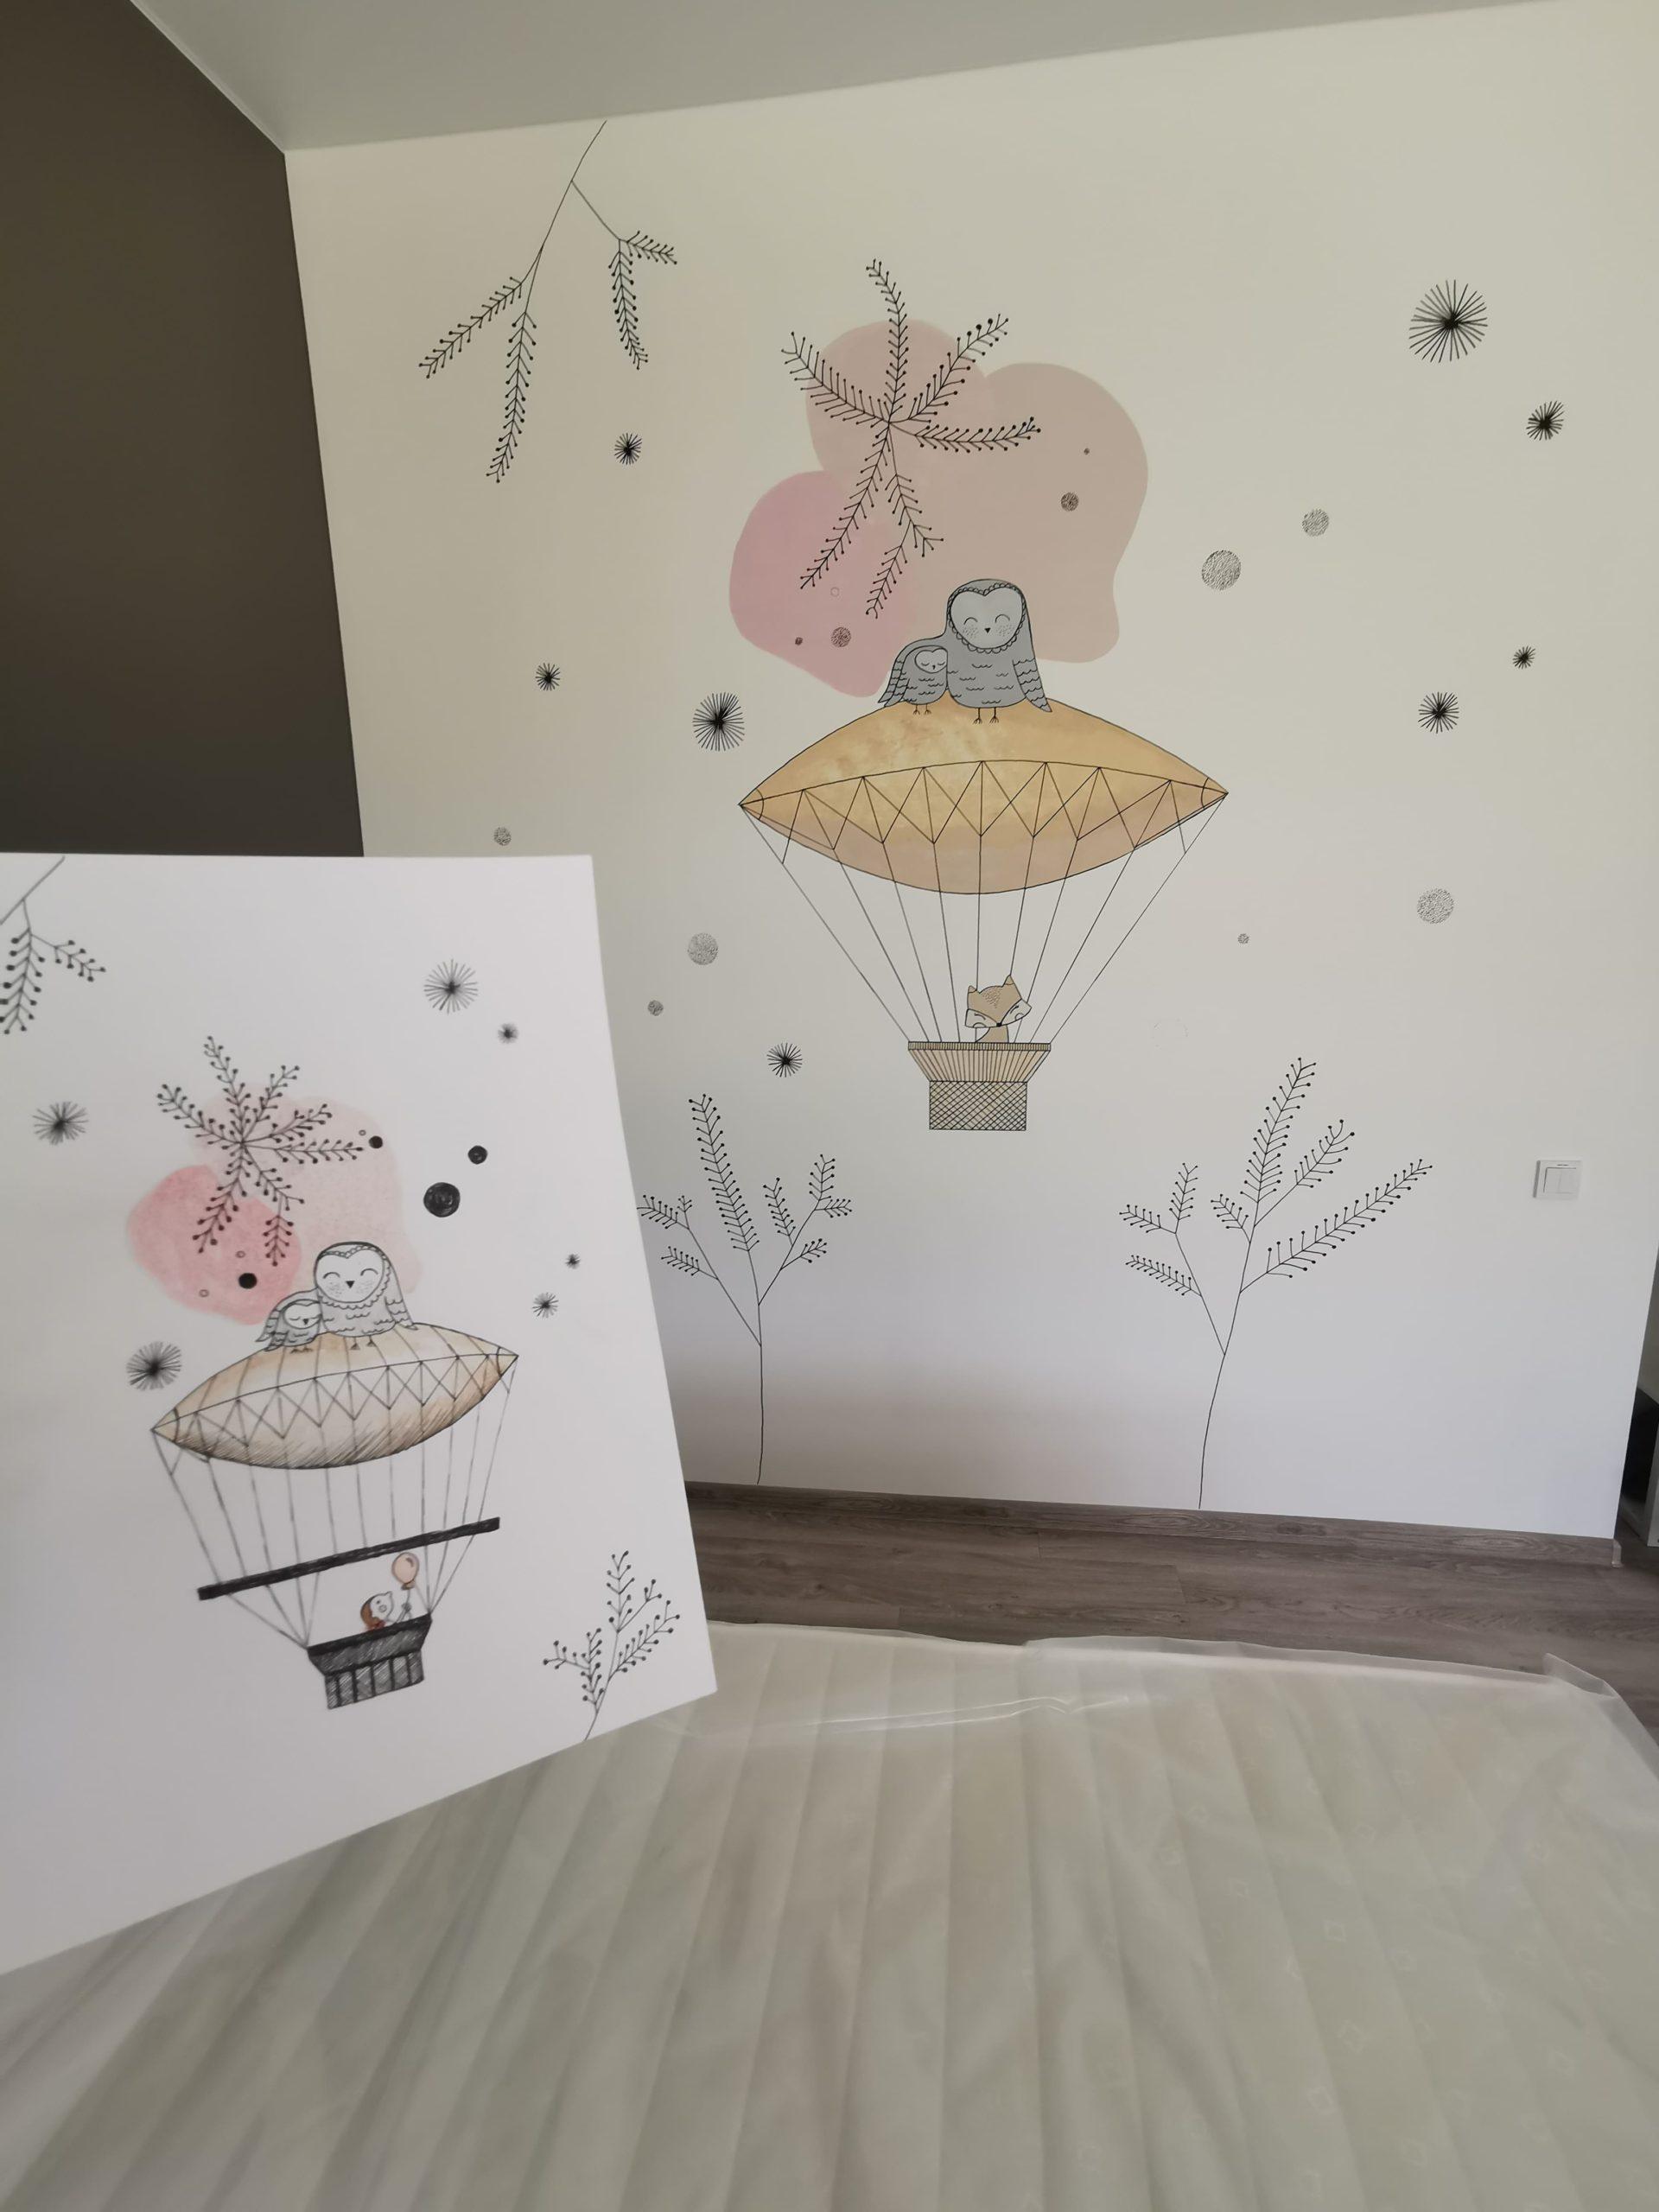 menine-kuryba-sienu-dekoravimas-ivairus-interjerai (24)